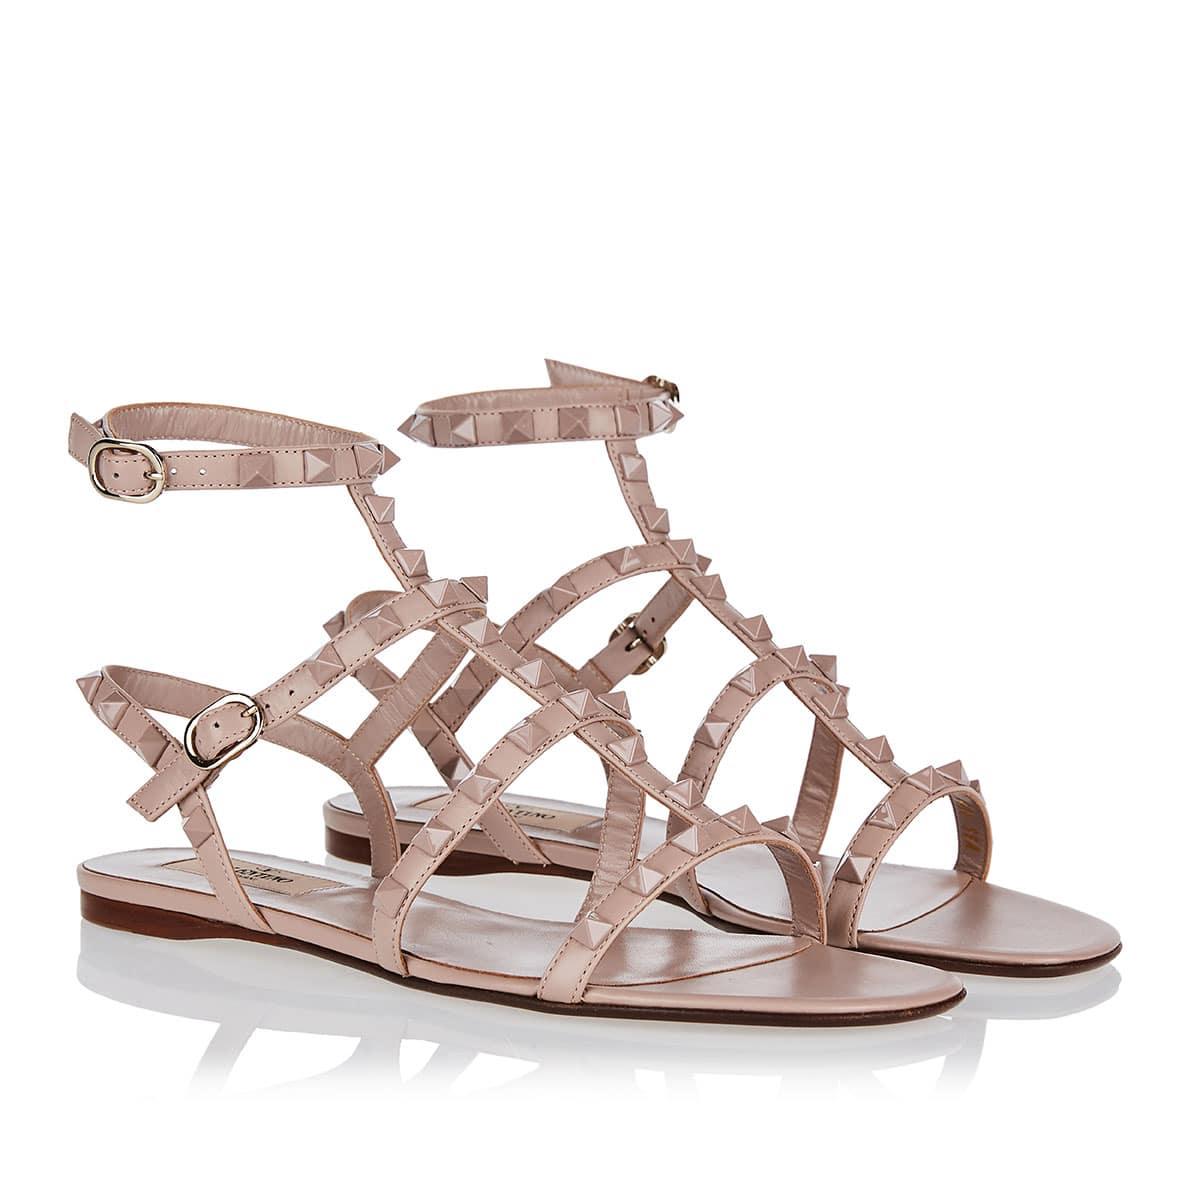 Rockstud leather sandals